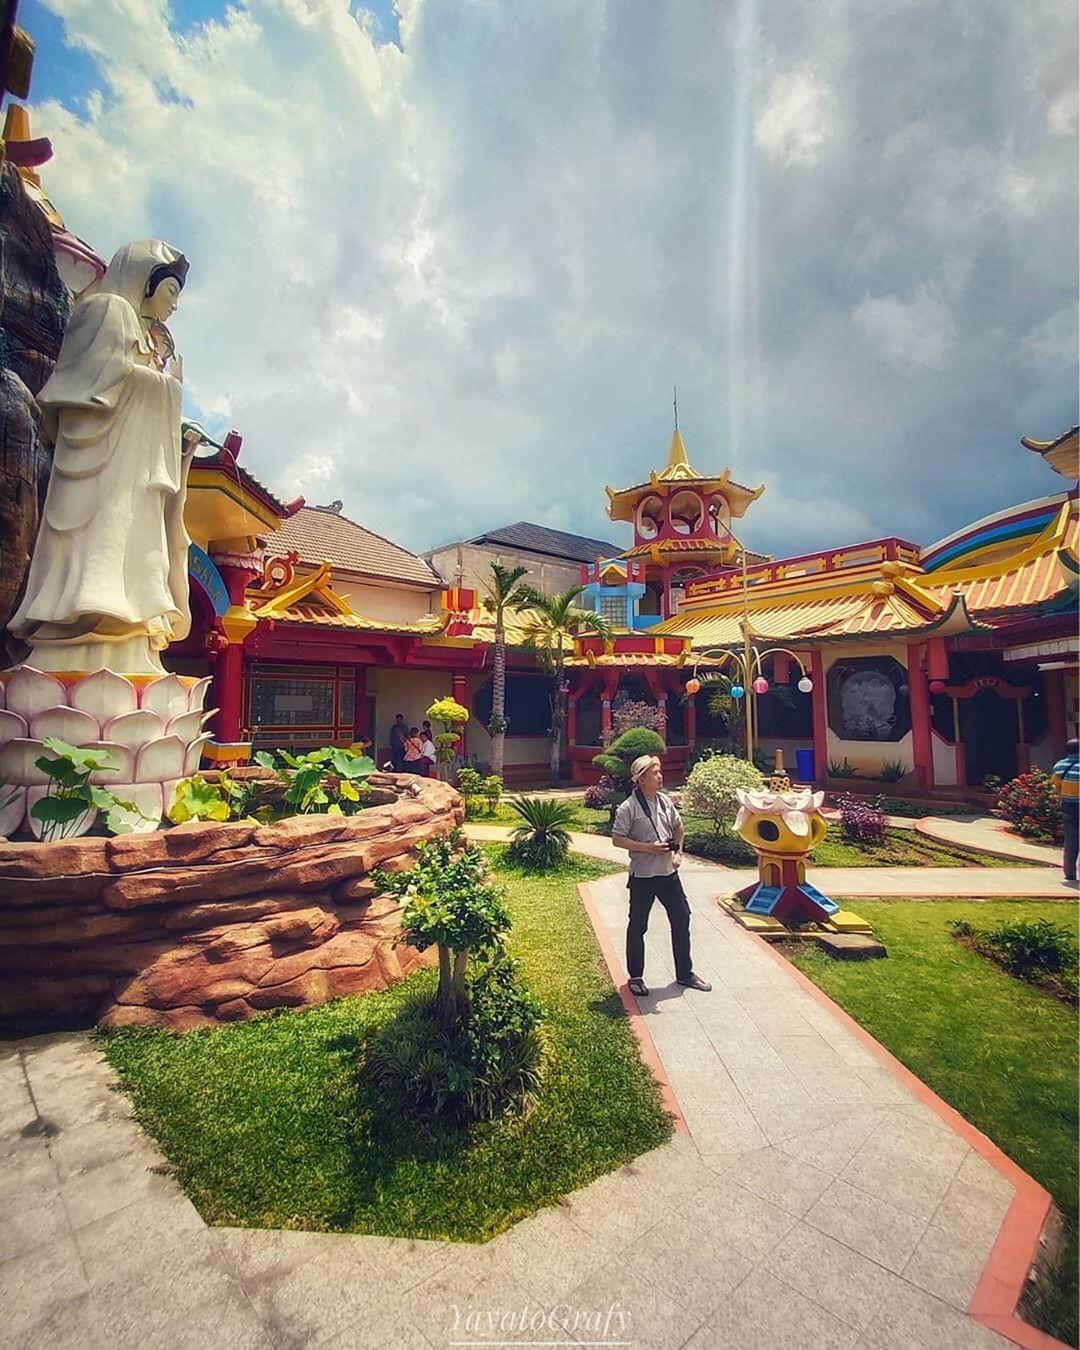 , 5 klenteng dan Vihara Bersejarah Yang Ada di Tangerang, INFO TANGERANG, INFO TANGERANG